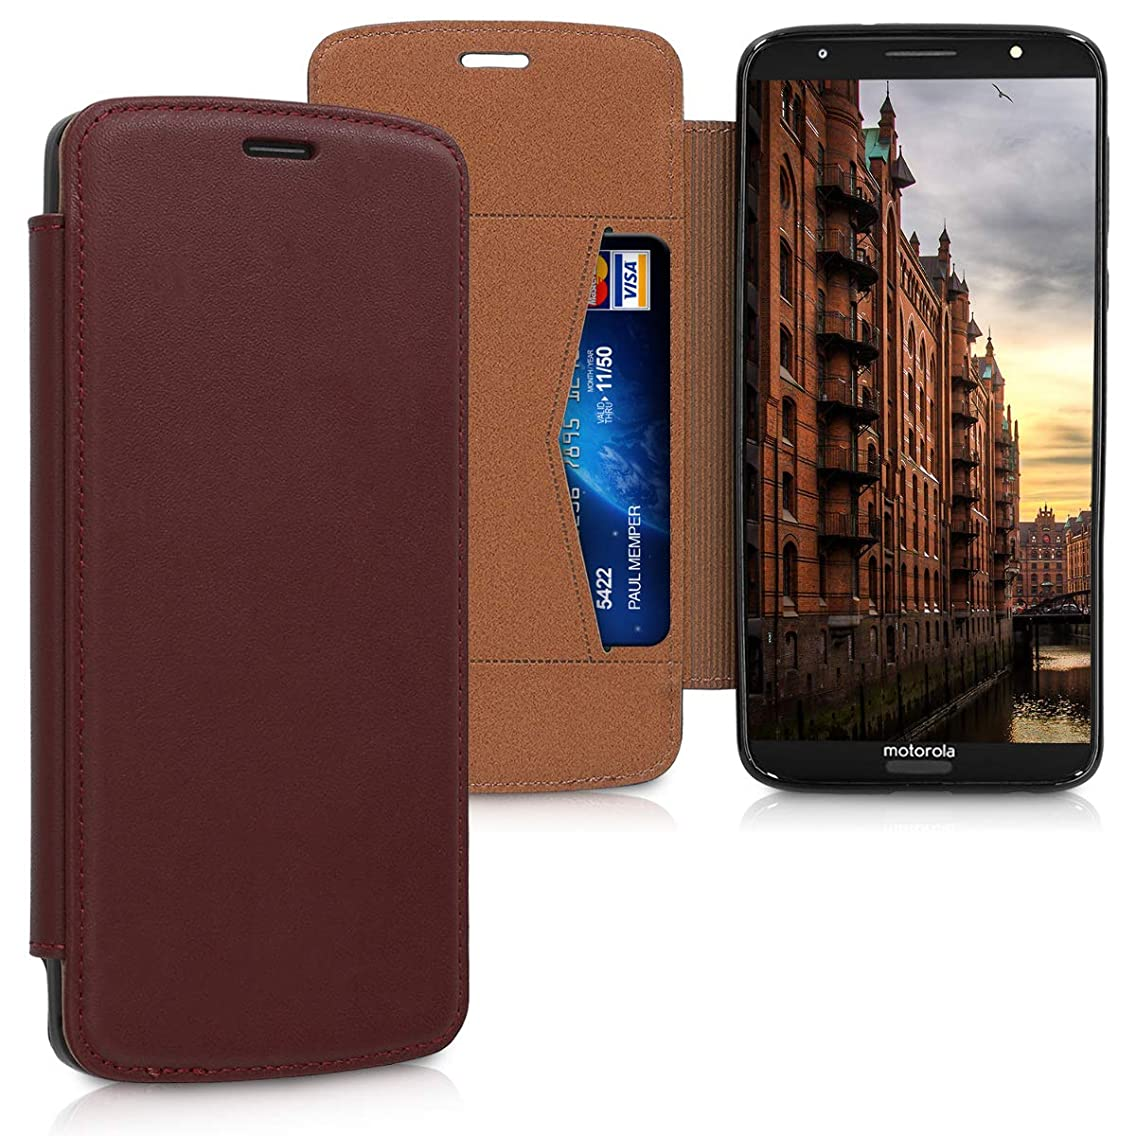 kalibri Leather Flip Case for Motorola Moto G6 Plus - Wallet Style Protective Smartphone Cover in Bordeaux